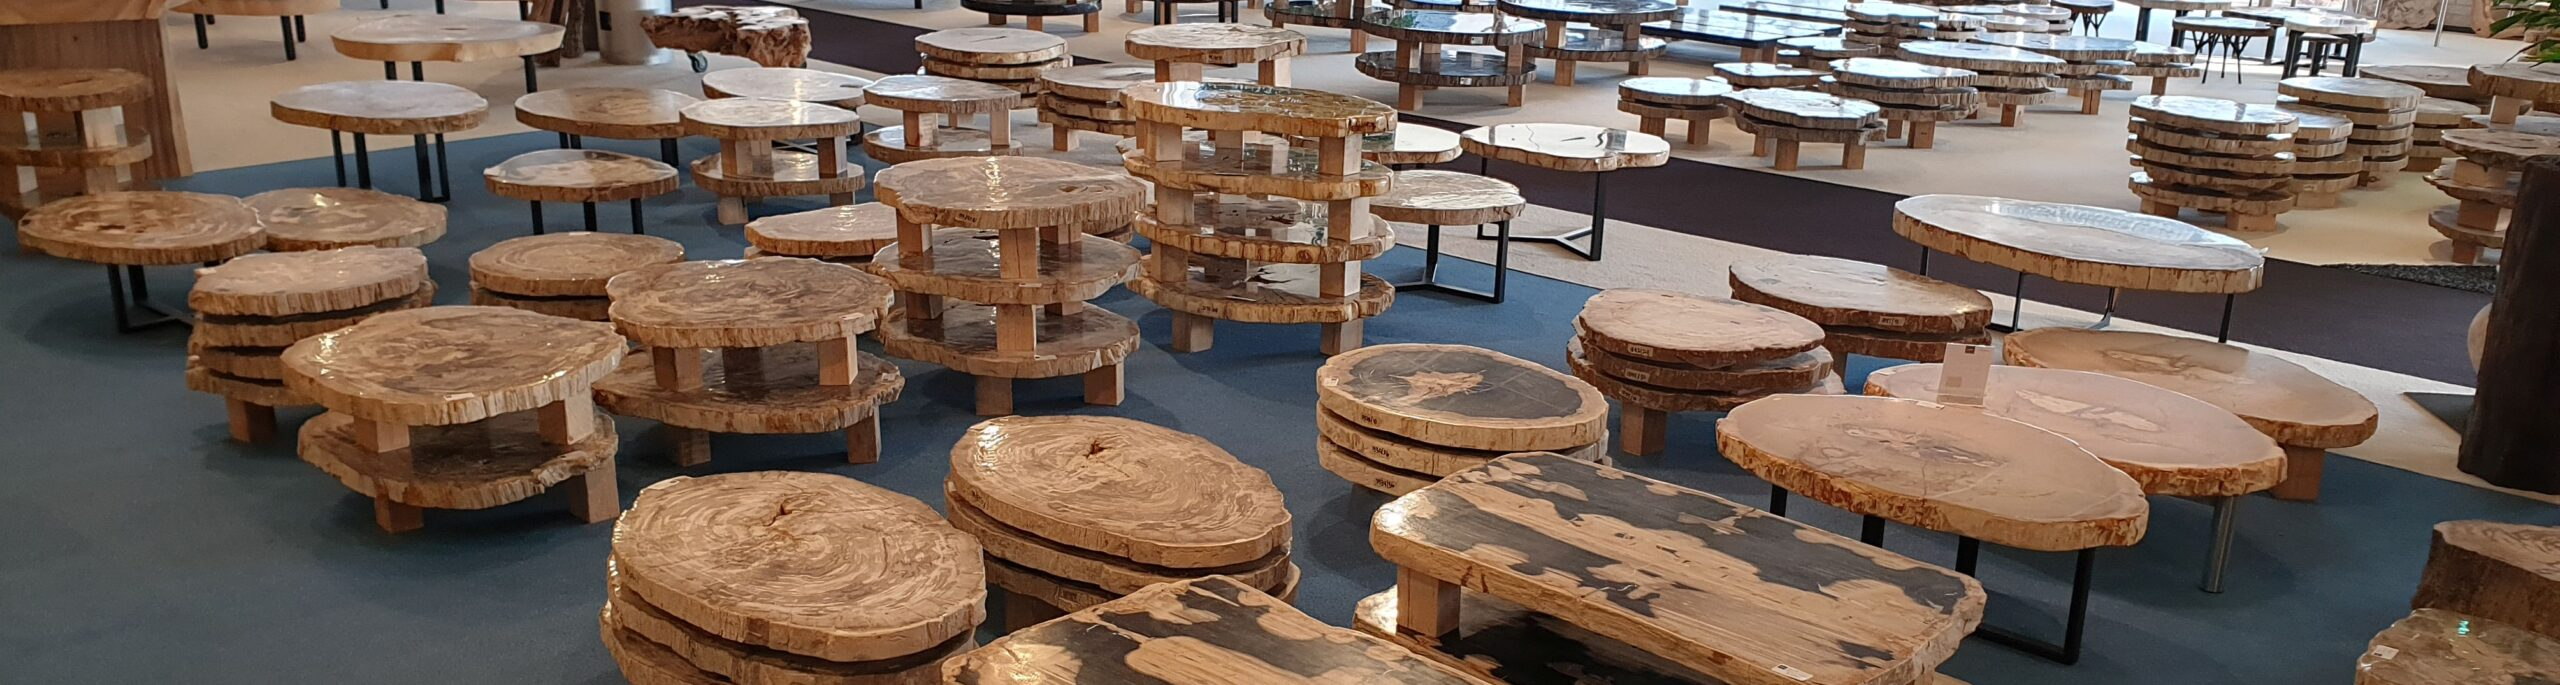 petrified wood xyleia natural interiors